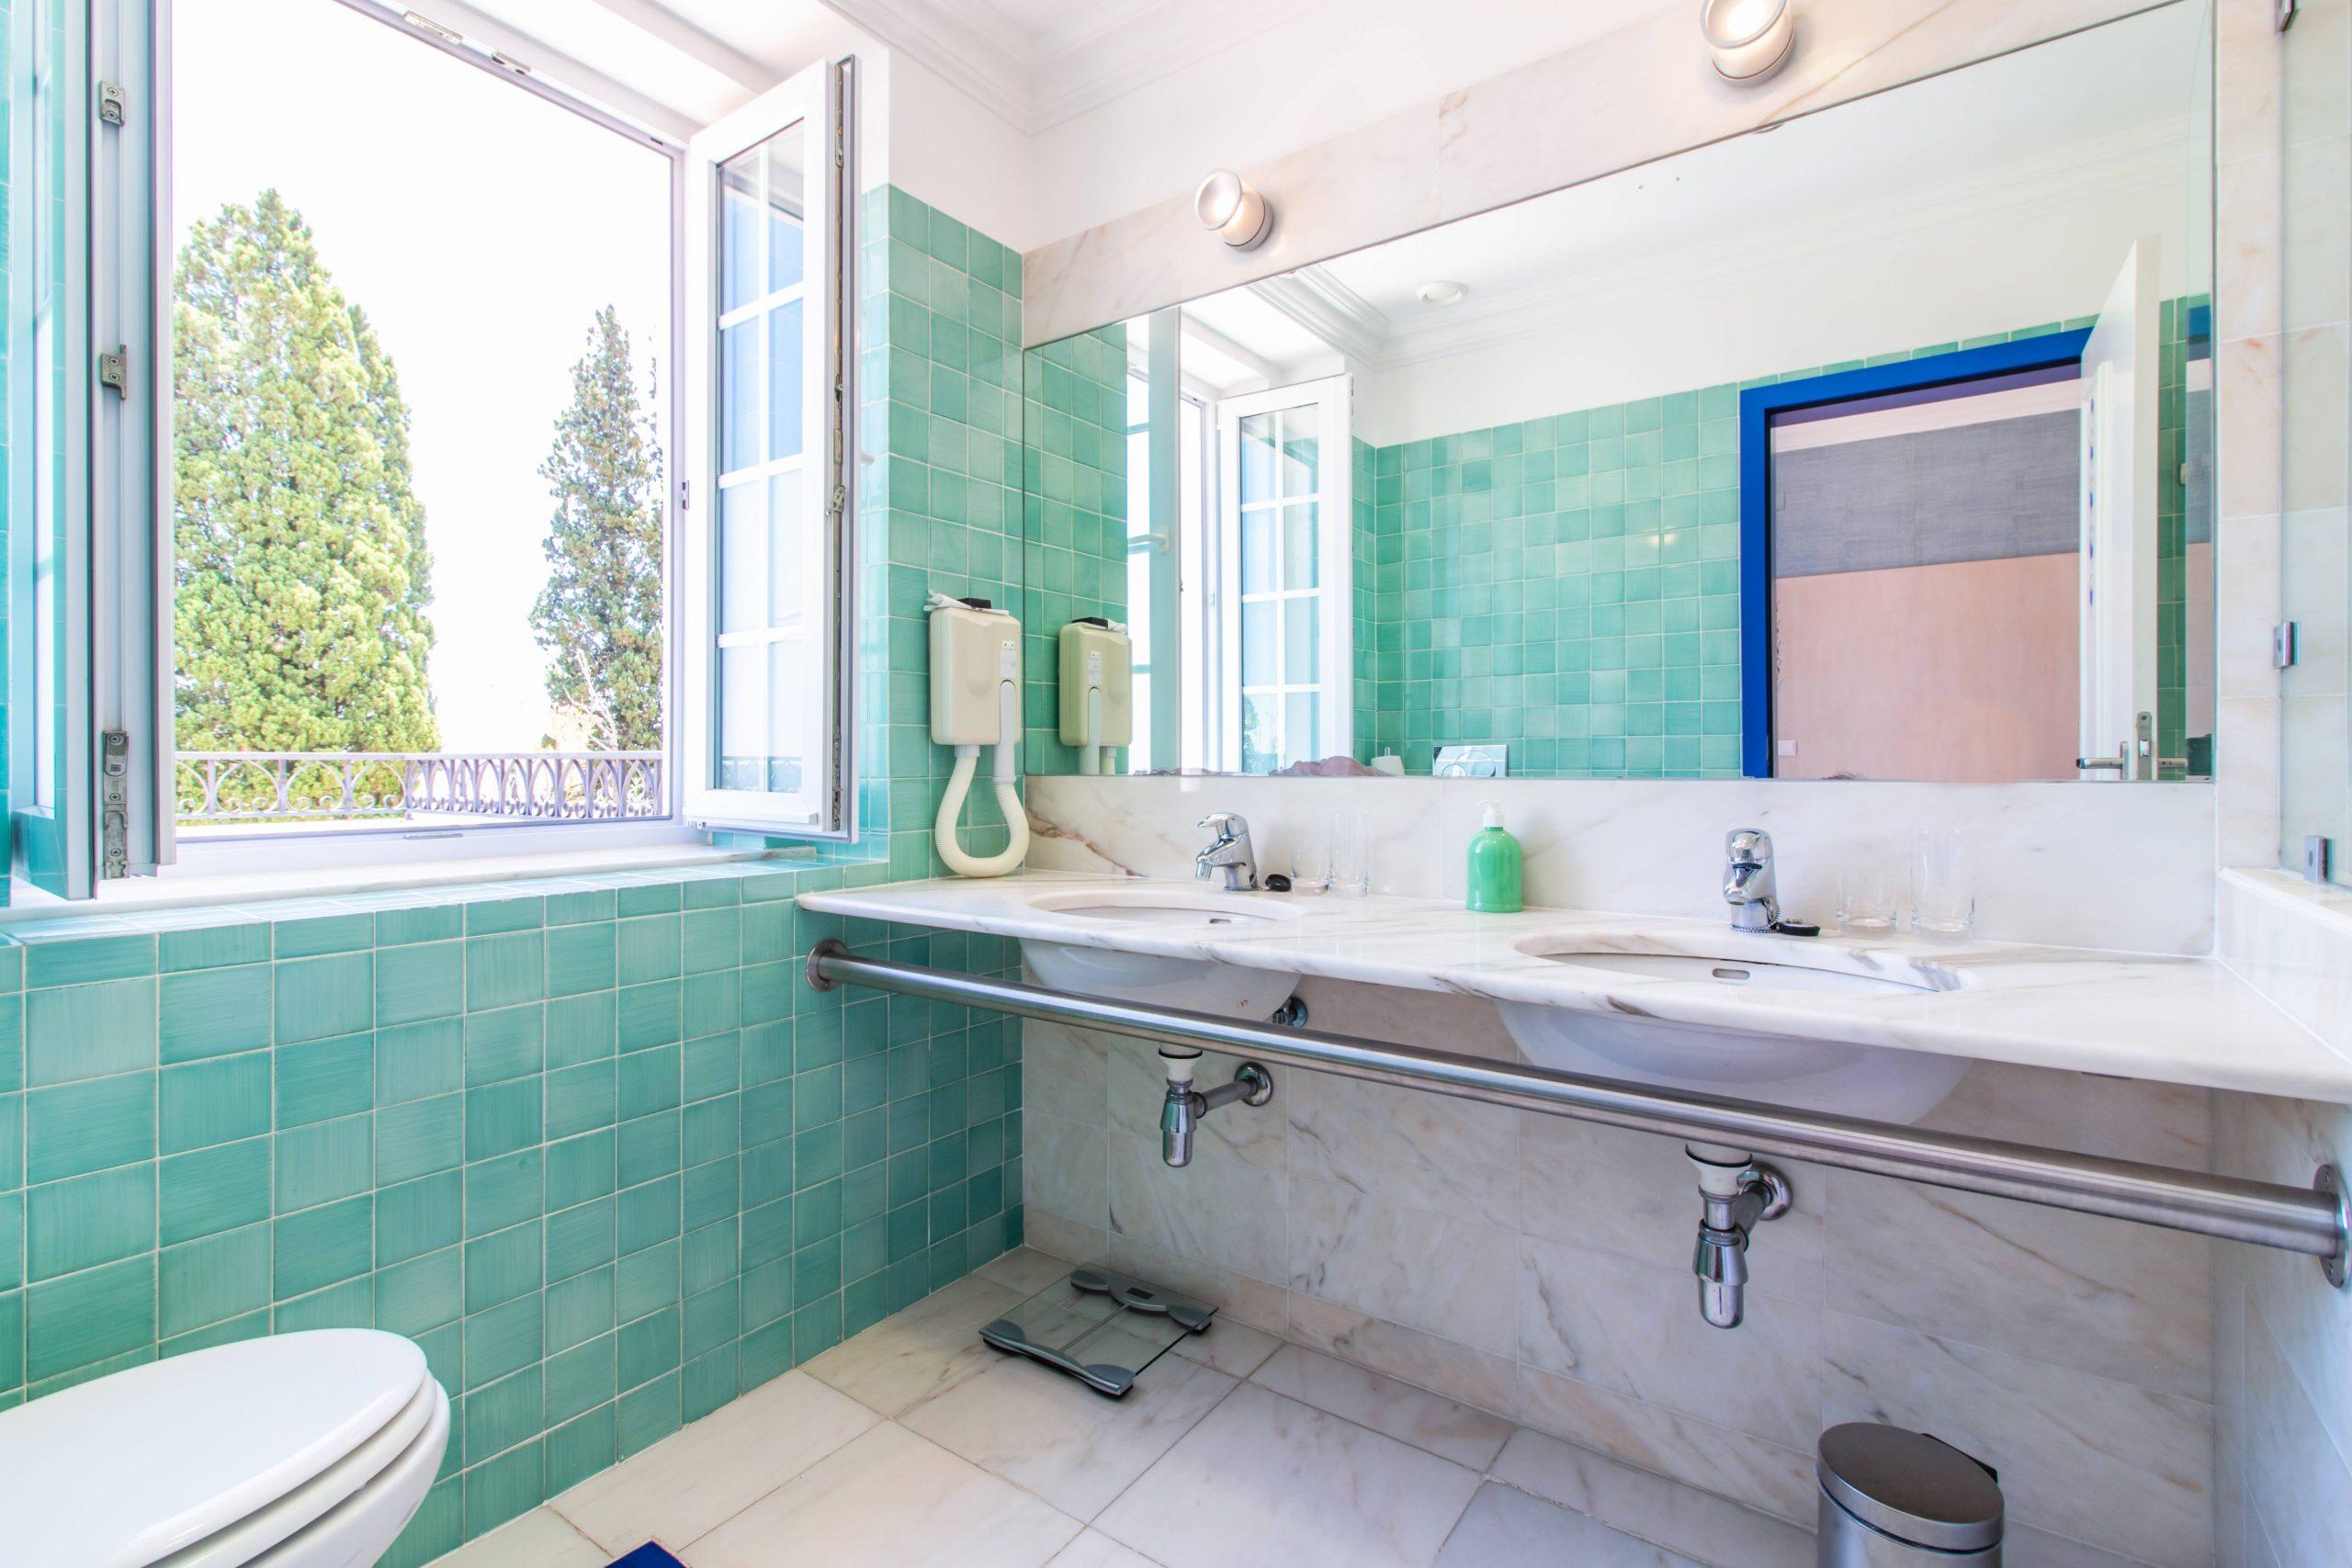 Hotel Lousal quarto duplo wc